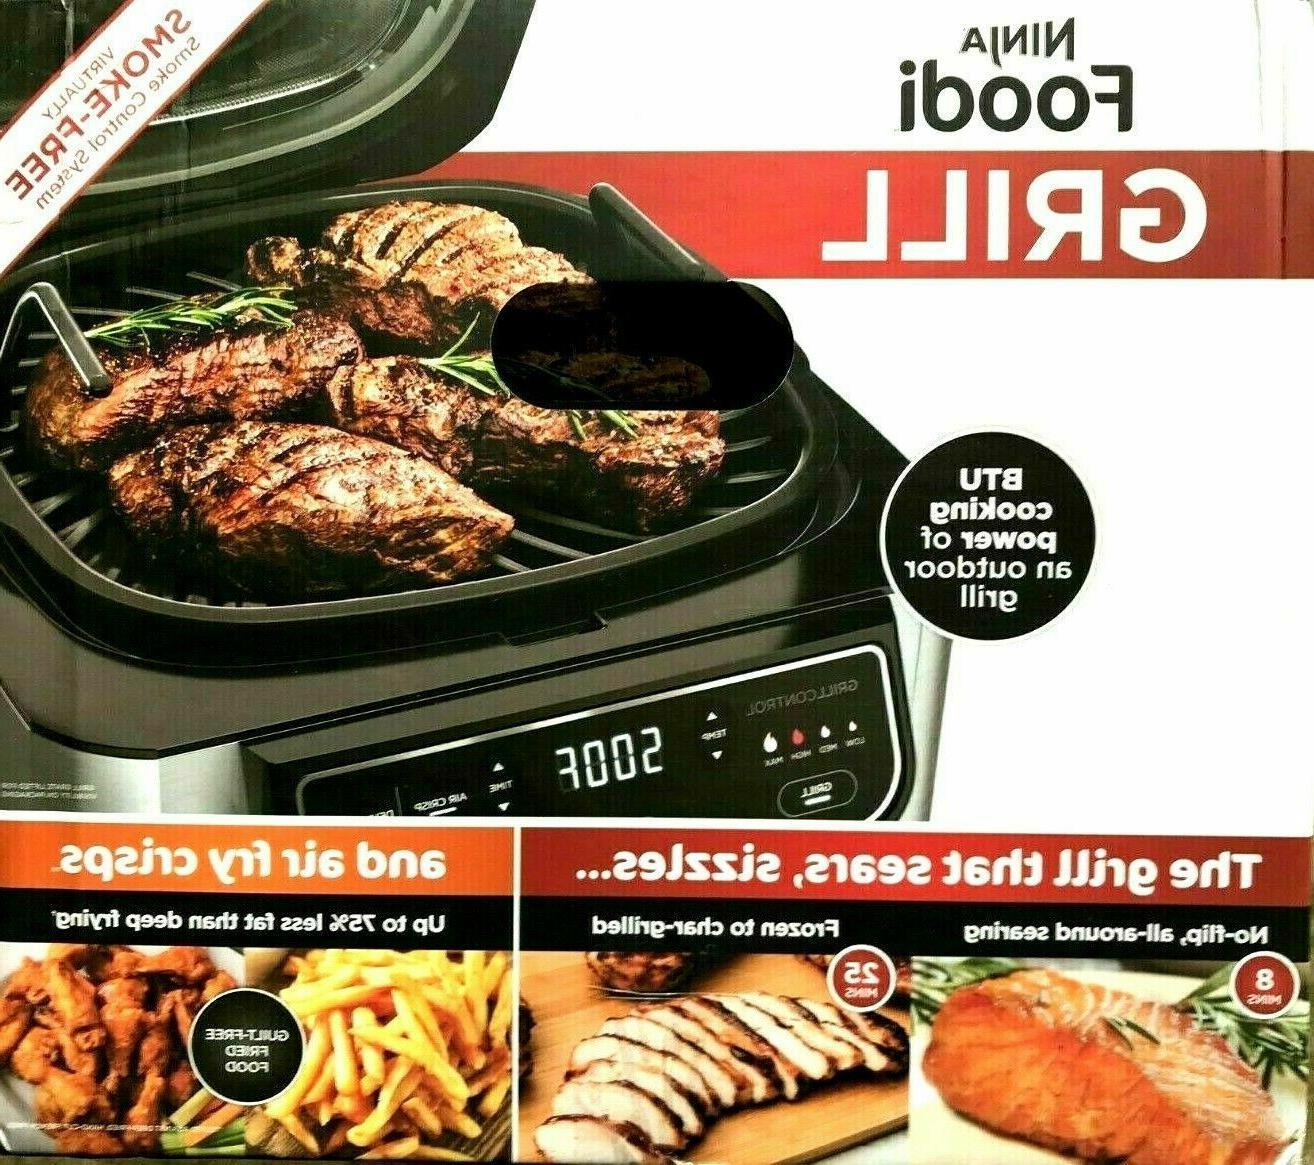 New Ninja Foodi 5-in-1 Indoor Grill with Air Fry, Roast, Bak